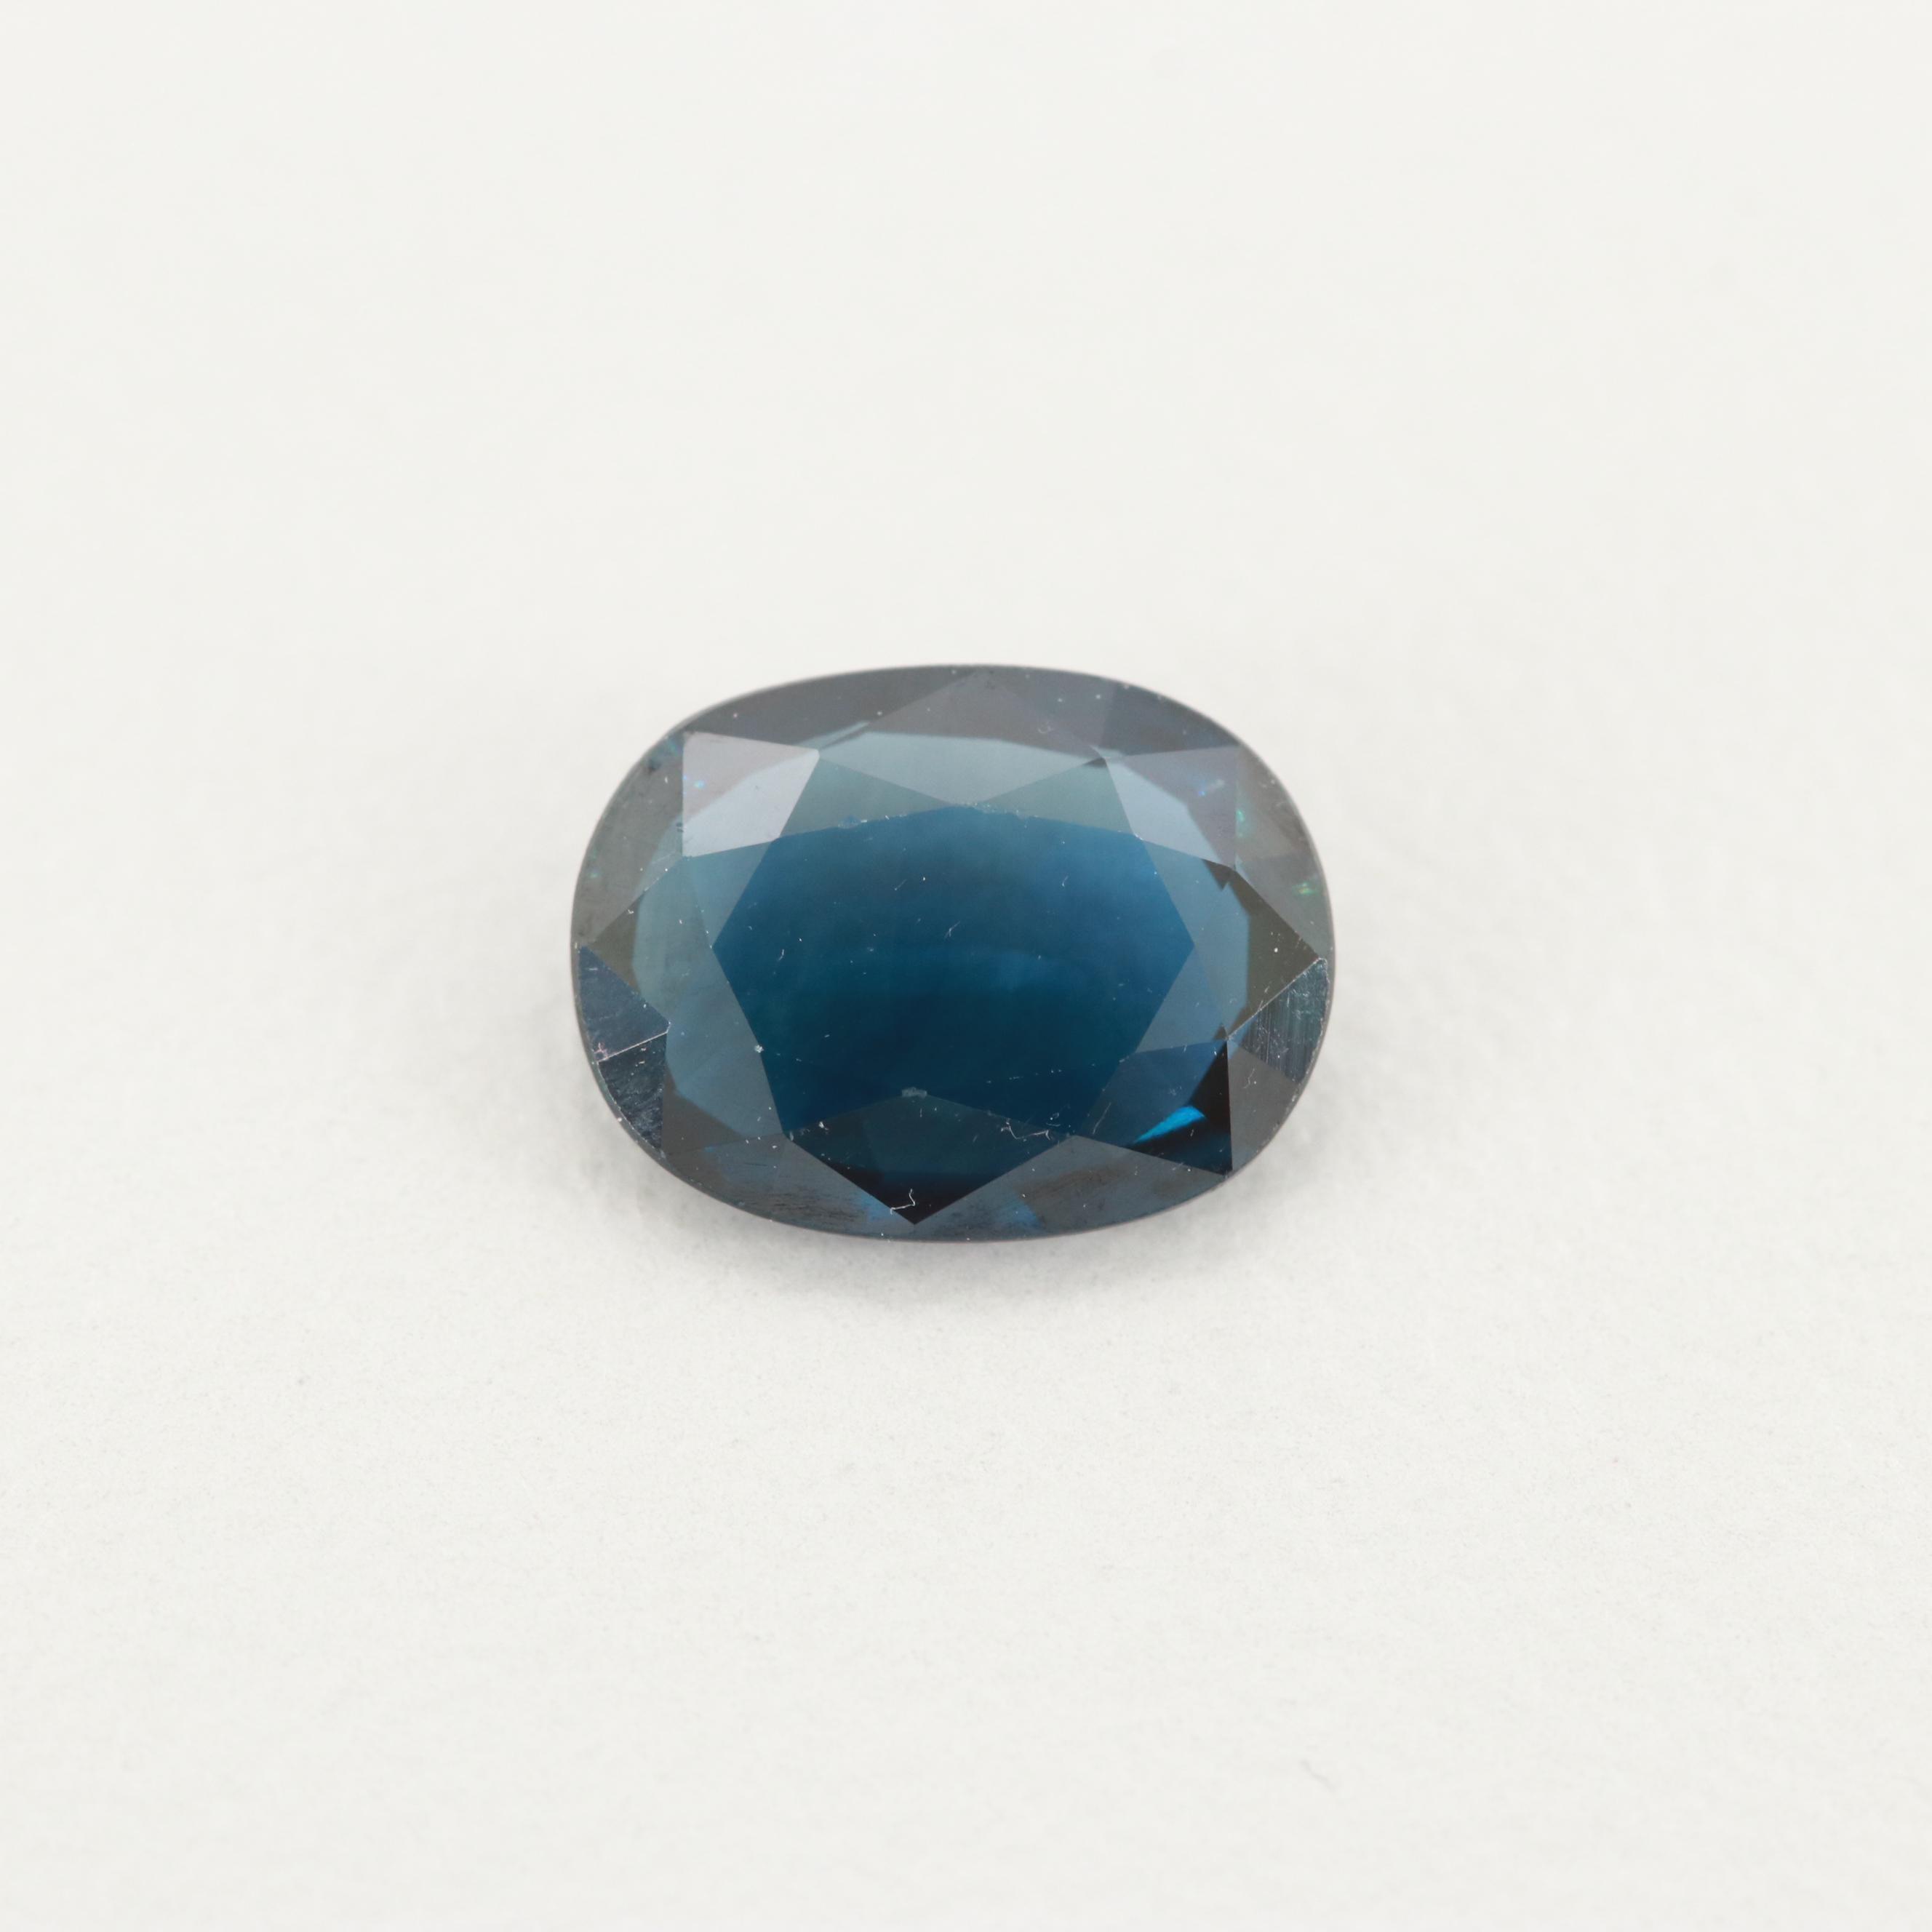 Loose 1.22 CT Sapphire Gemstone